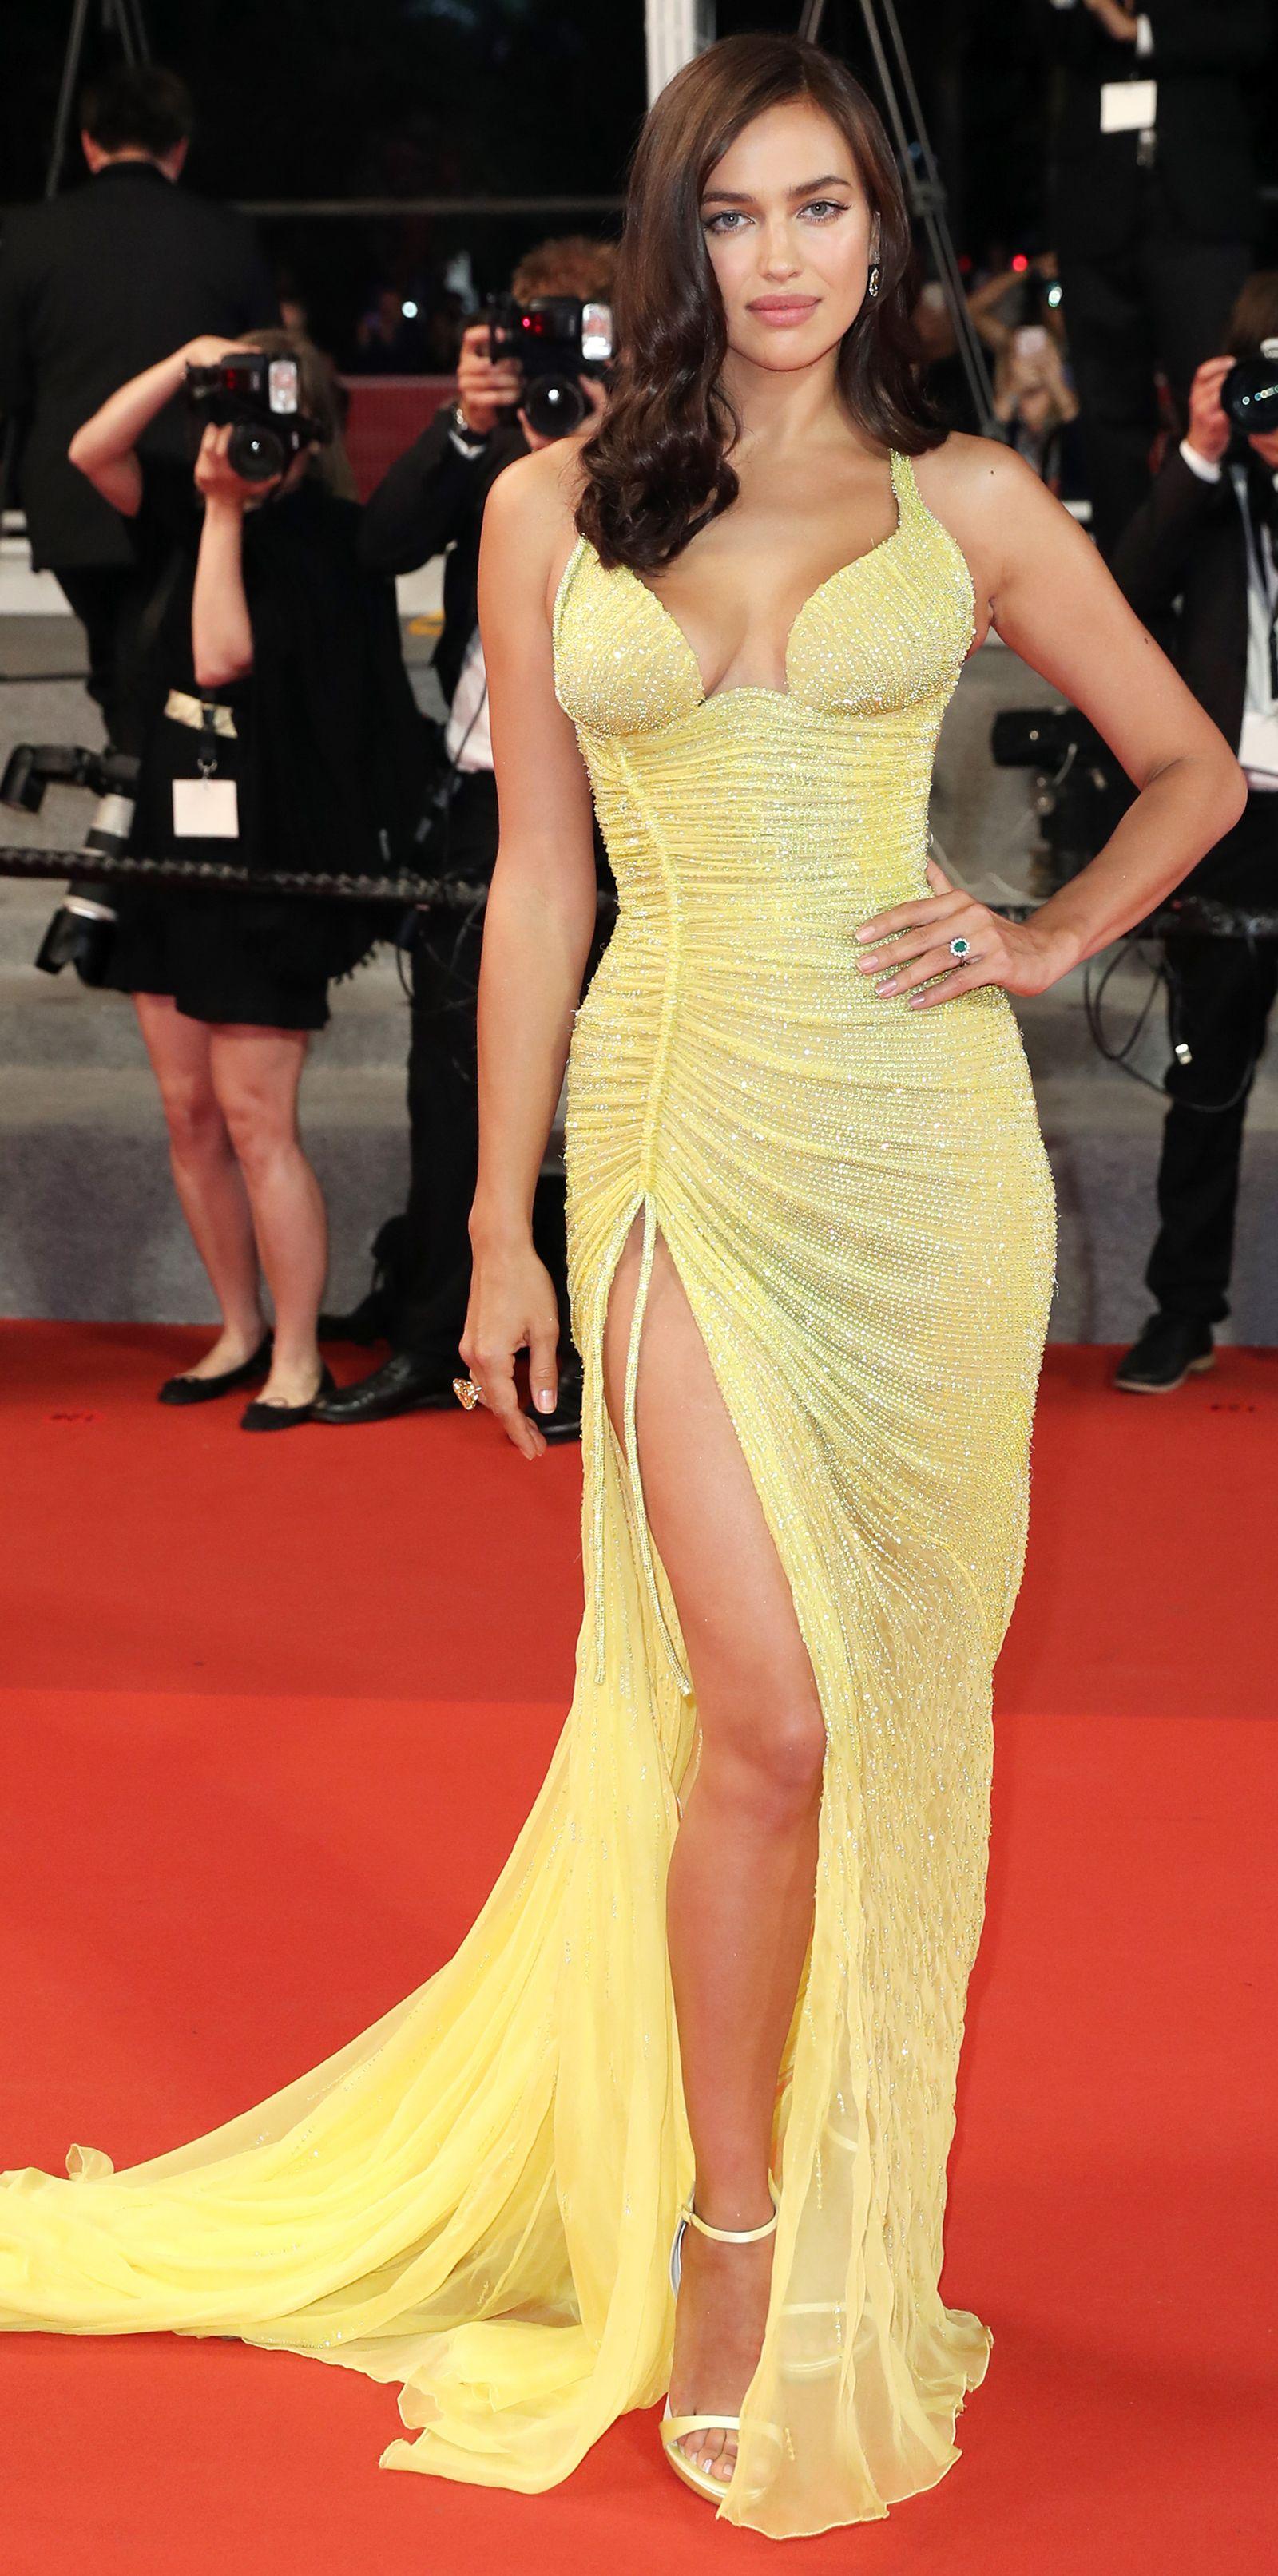 Look of the Day | Yellow & Gold Dresses | Pinterest | Irina shayk ...